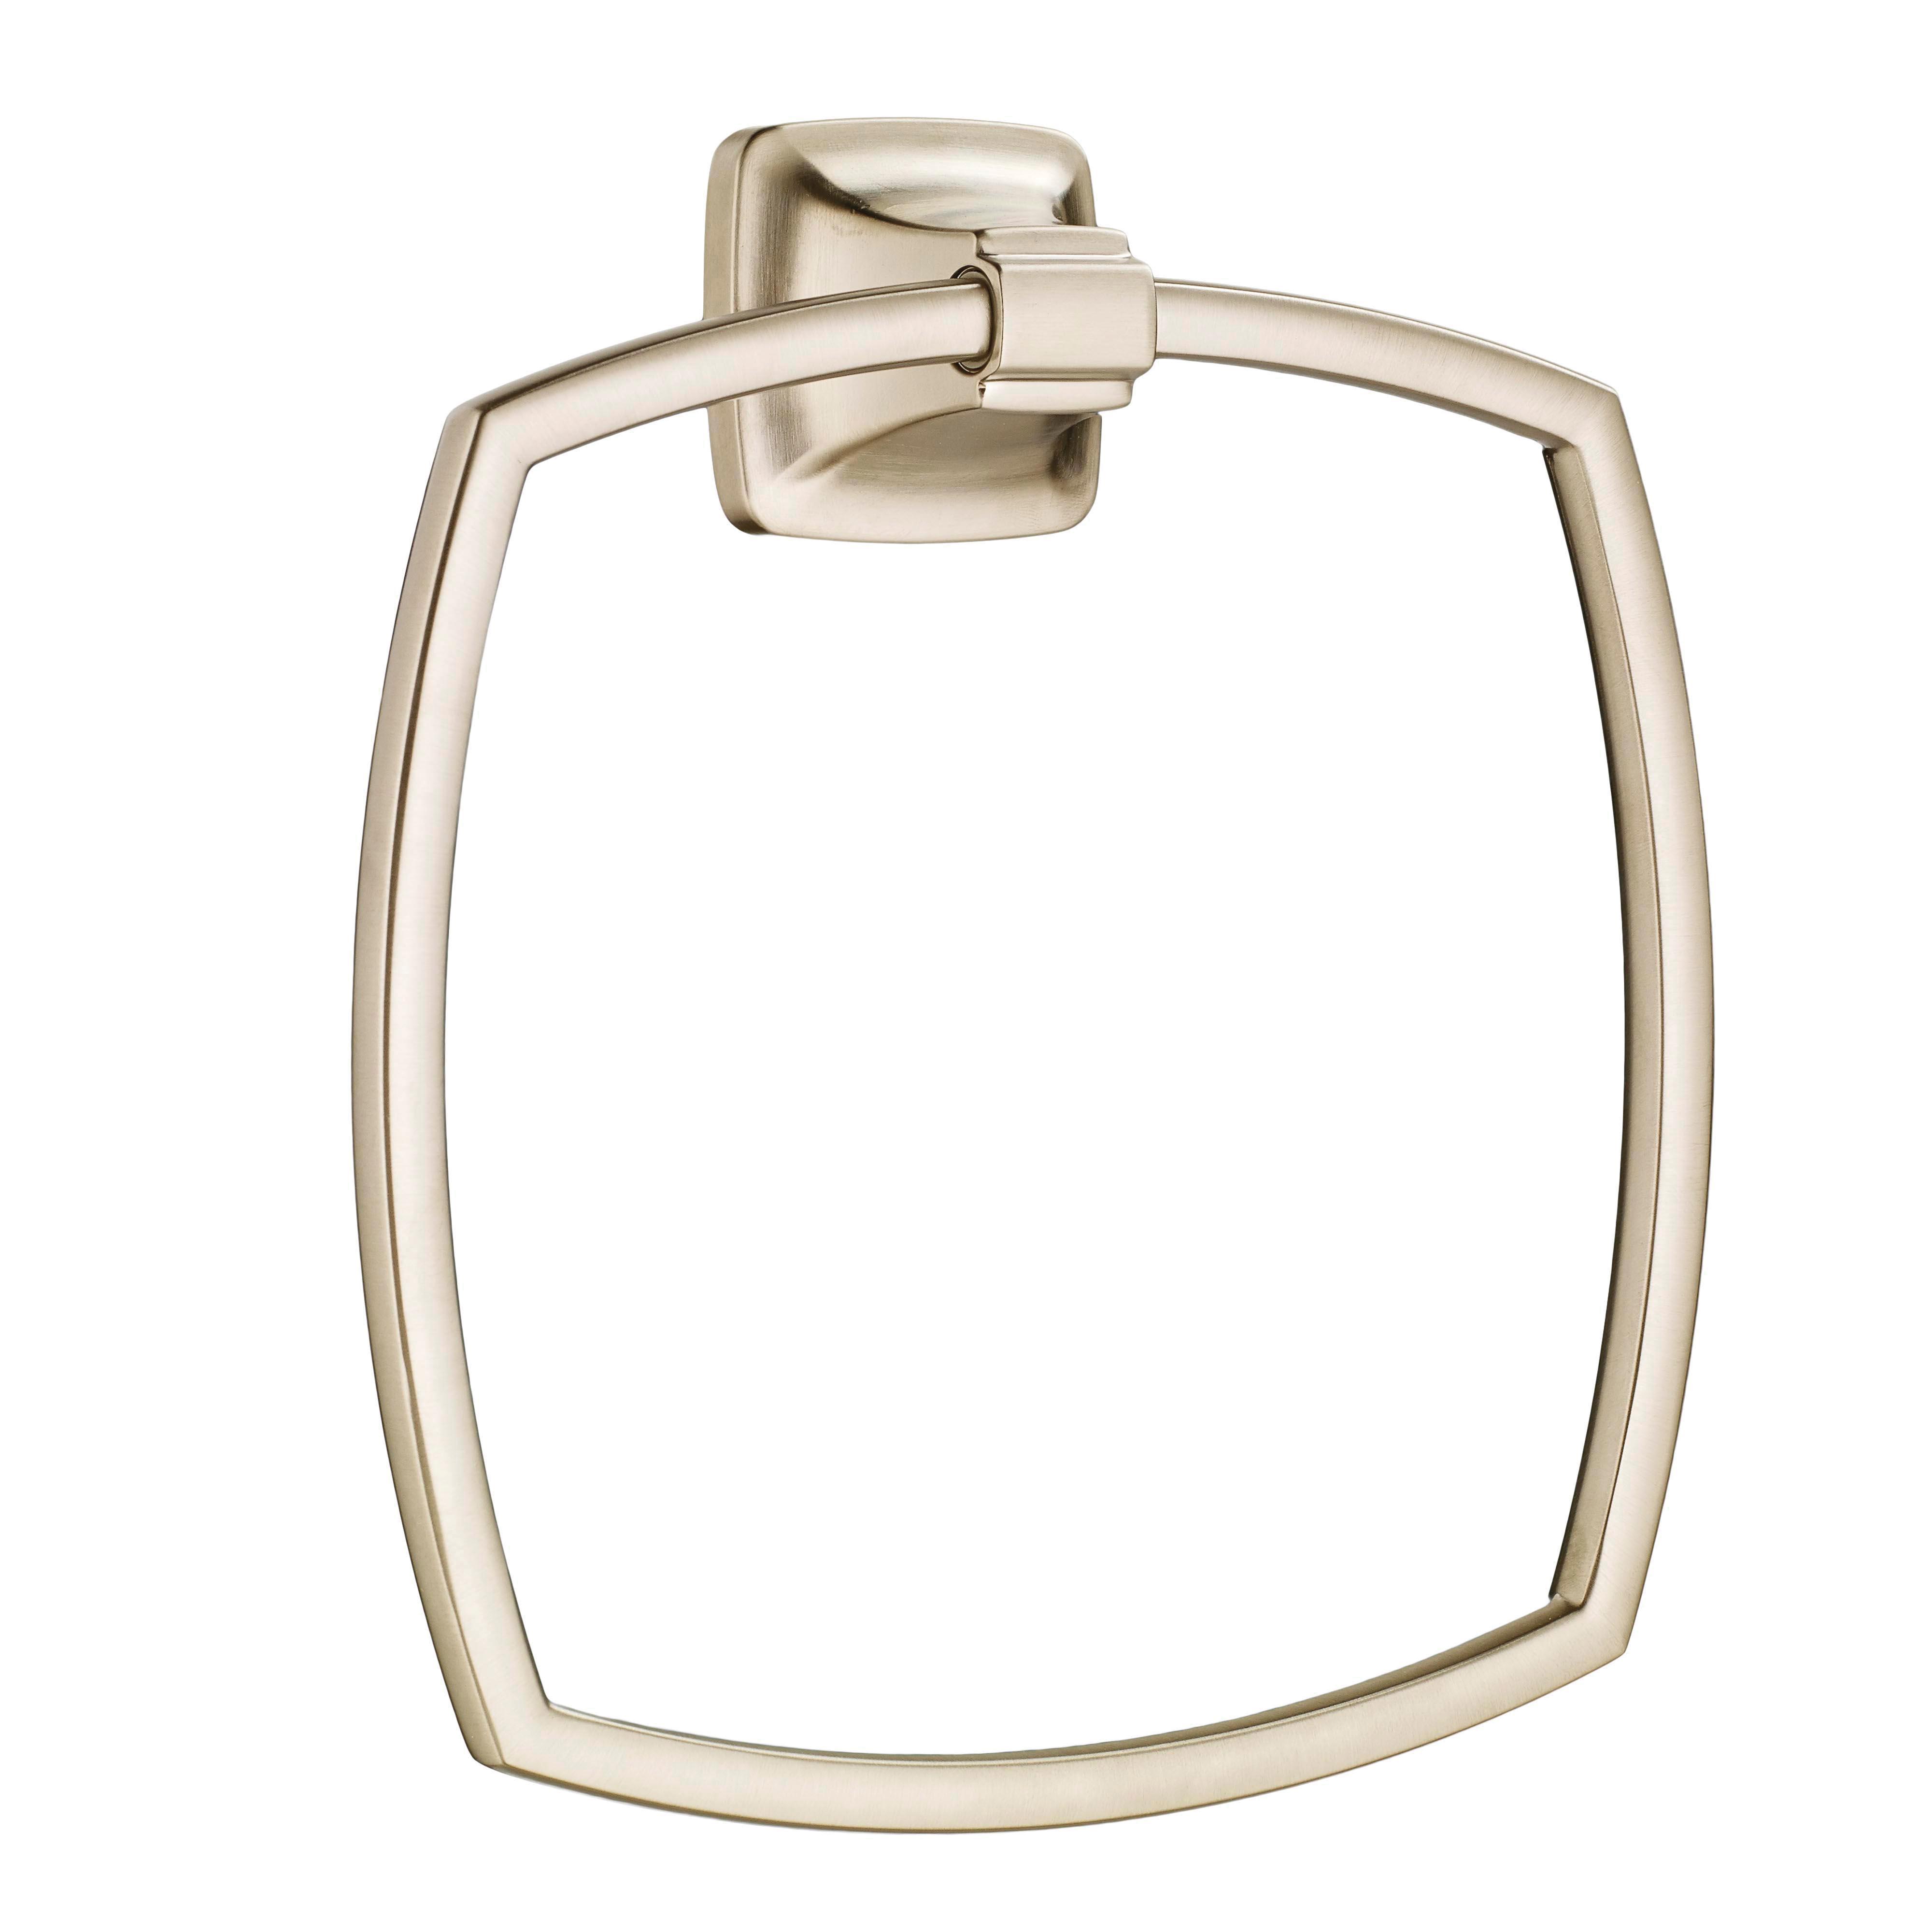 American Standard 7353190.295 Townsend® Bath Towel Ring, 6-7/8 in Dia Ring, 1-3/4 in OAD x 8-1/8 in OAH, Metal, Import